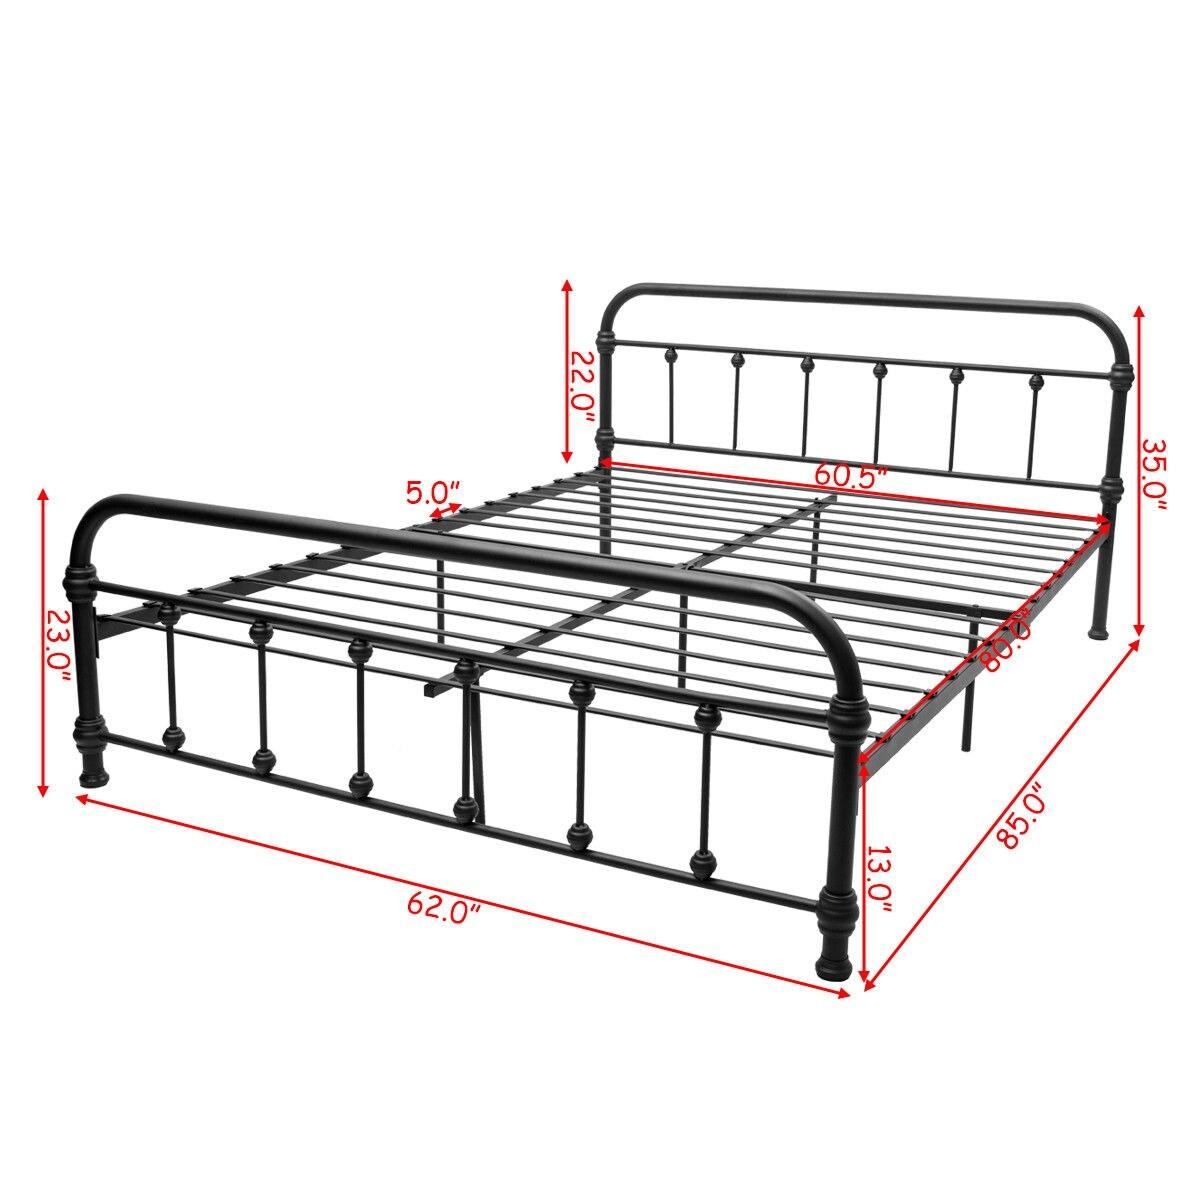 0ee1a717deeb Shop Costway Queen Size Metal Steel Bed Frame W/ Stable Metal Slats  Headboard Footboard Black - Free Shipping Today - Overstock - 20708436